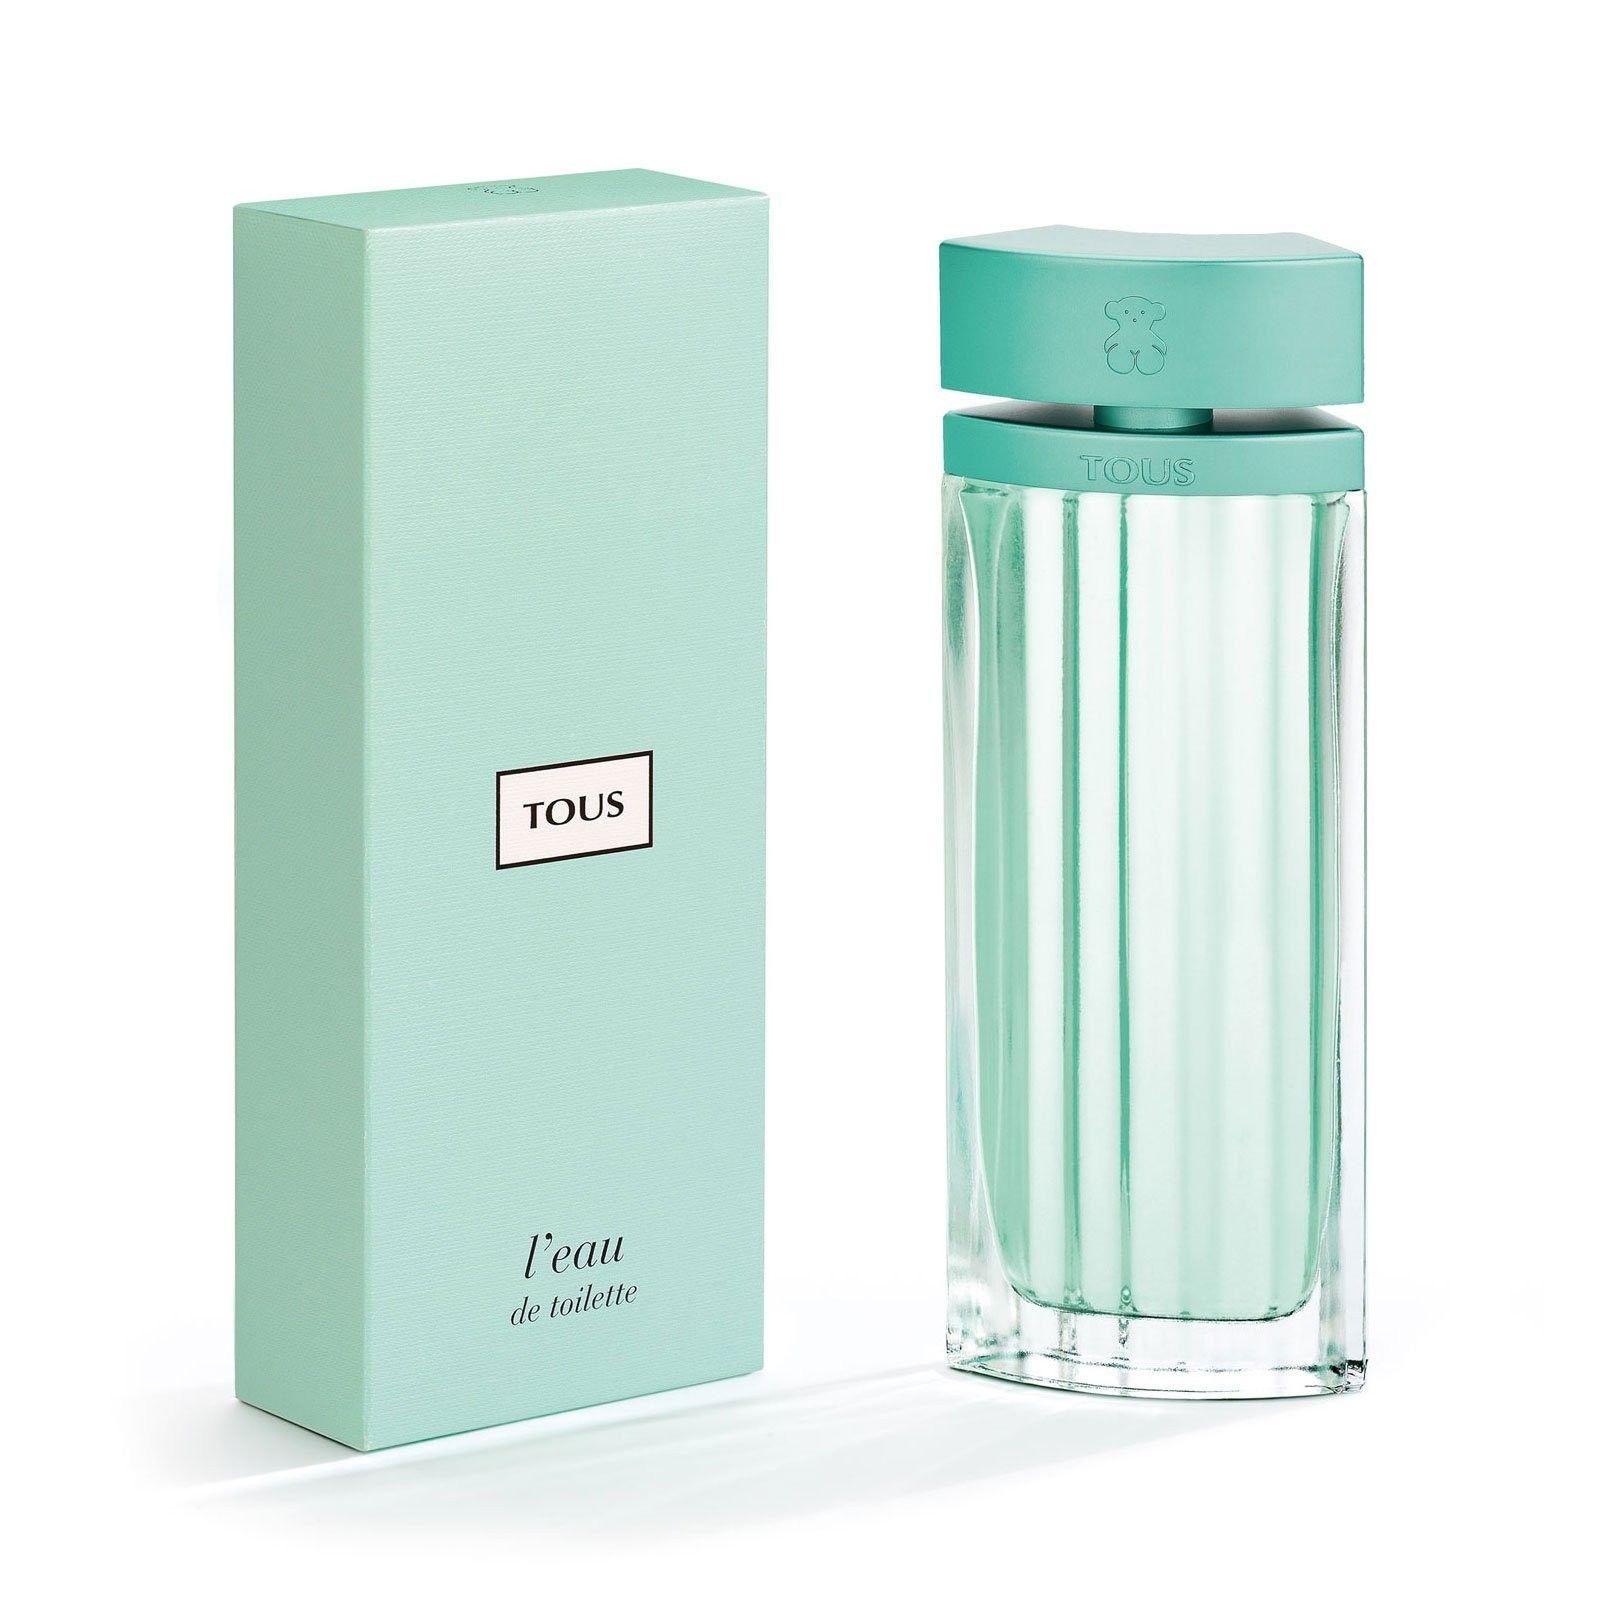 Tous L'eau   Perfume, Fragancia, Perfumeria